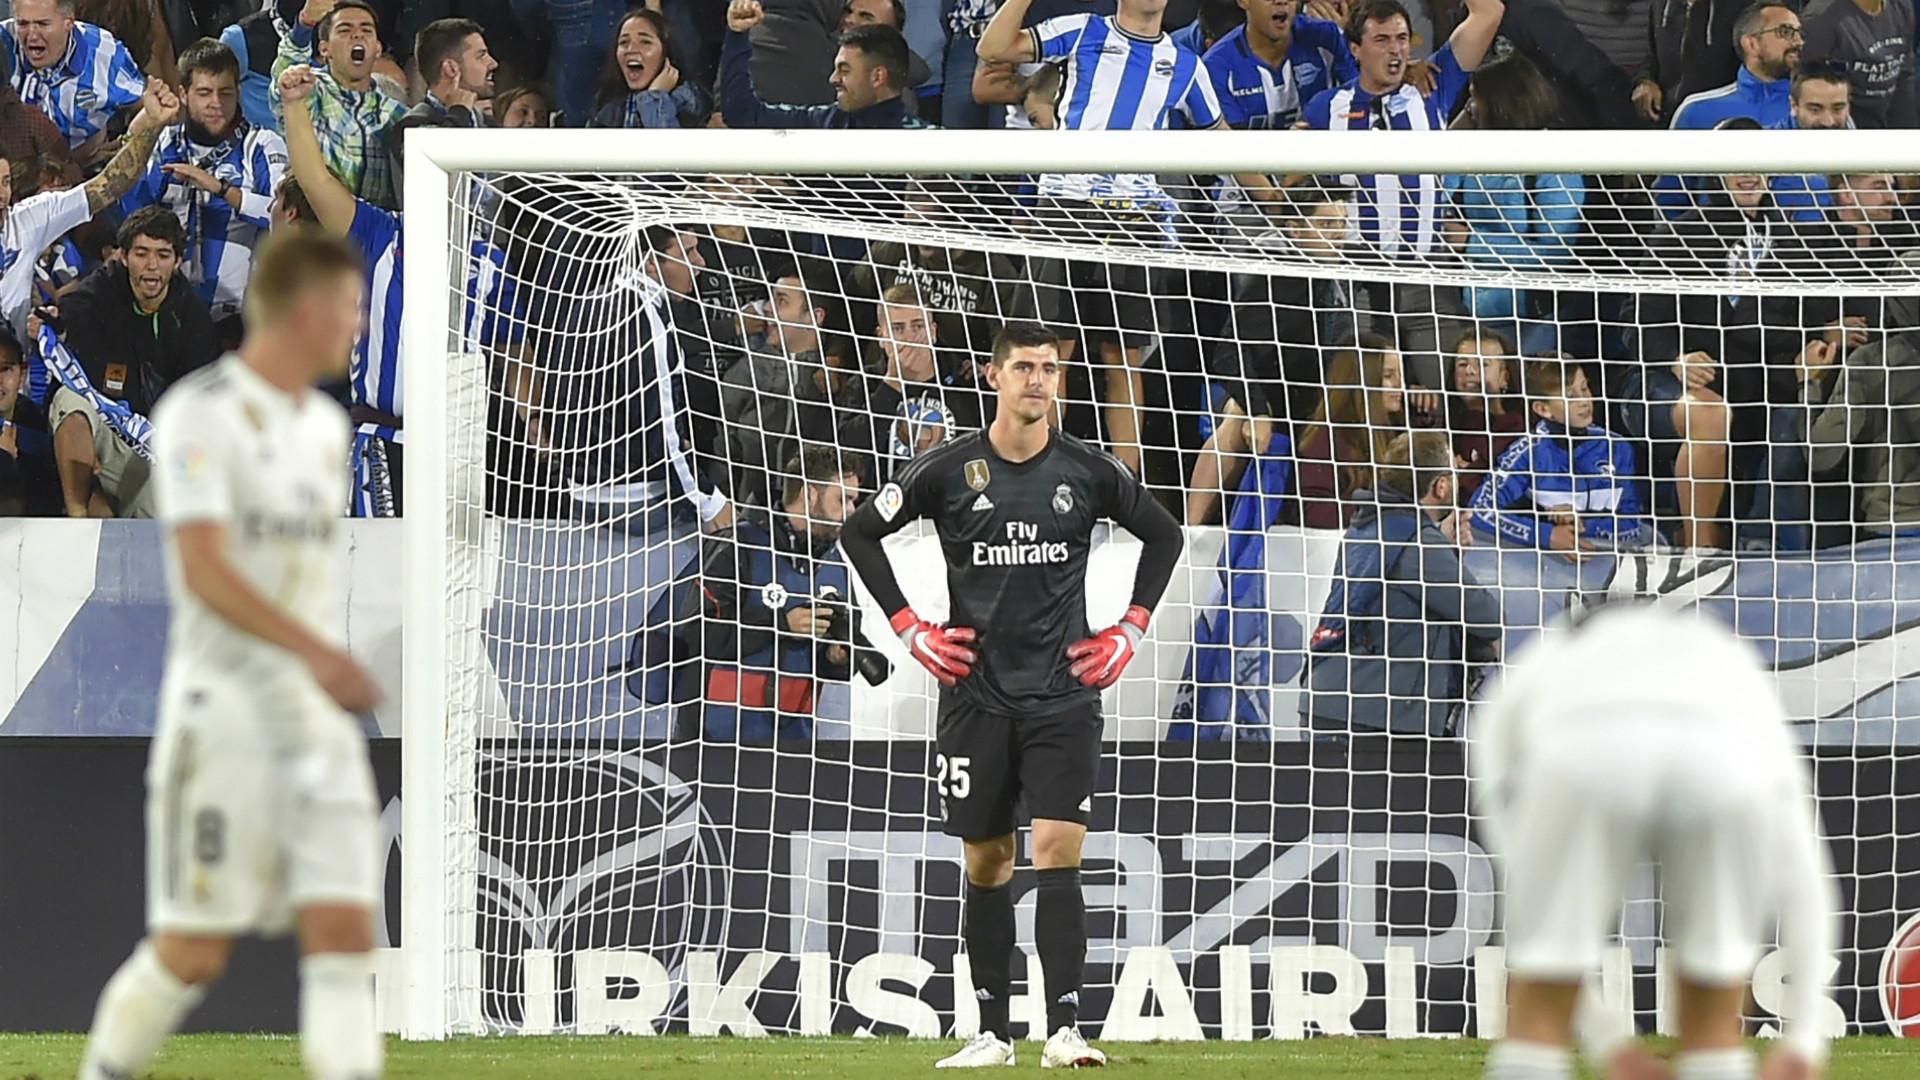 Thibaut Courtois, Real Madrid v Alaves, 2018